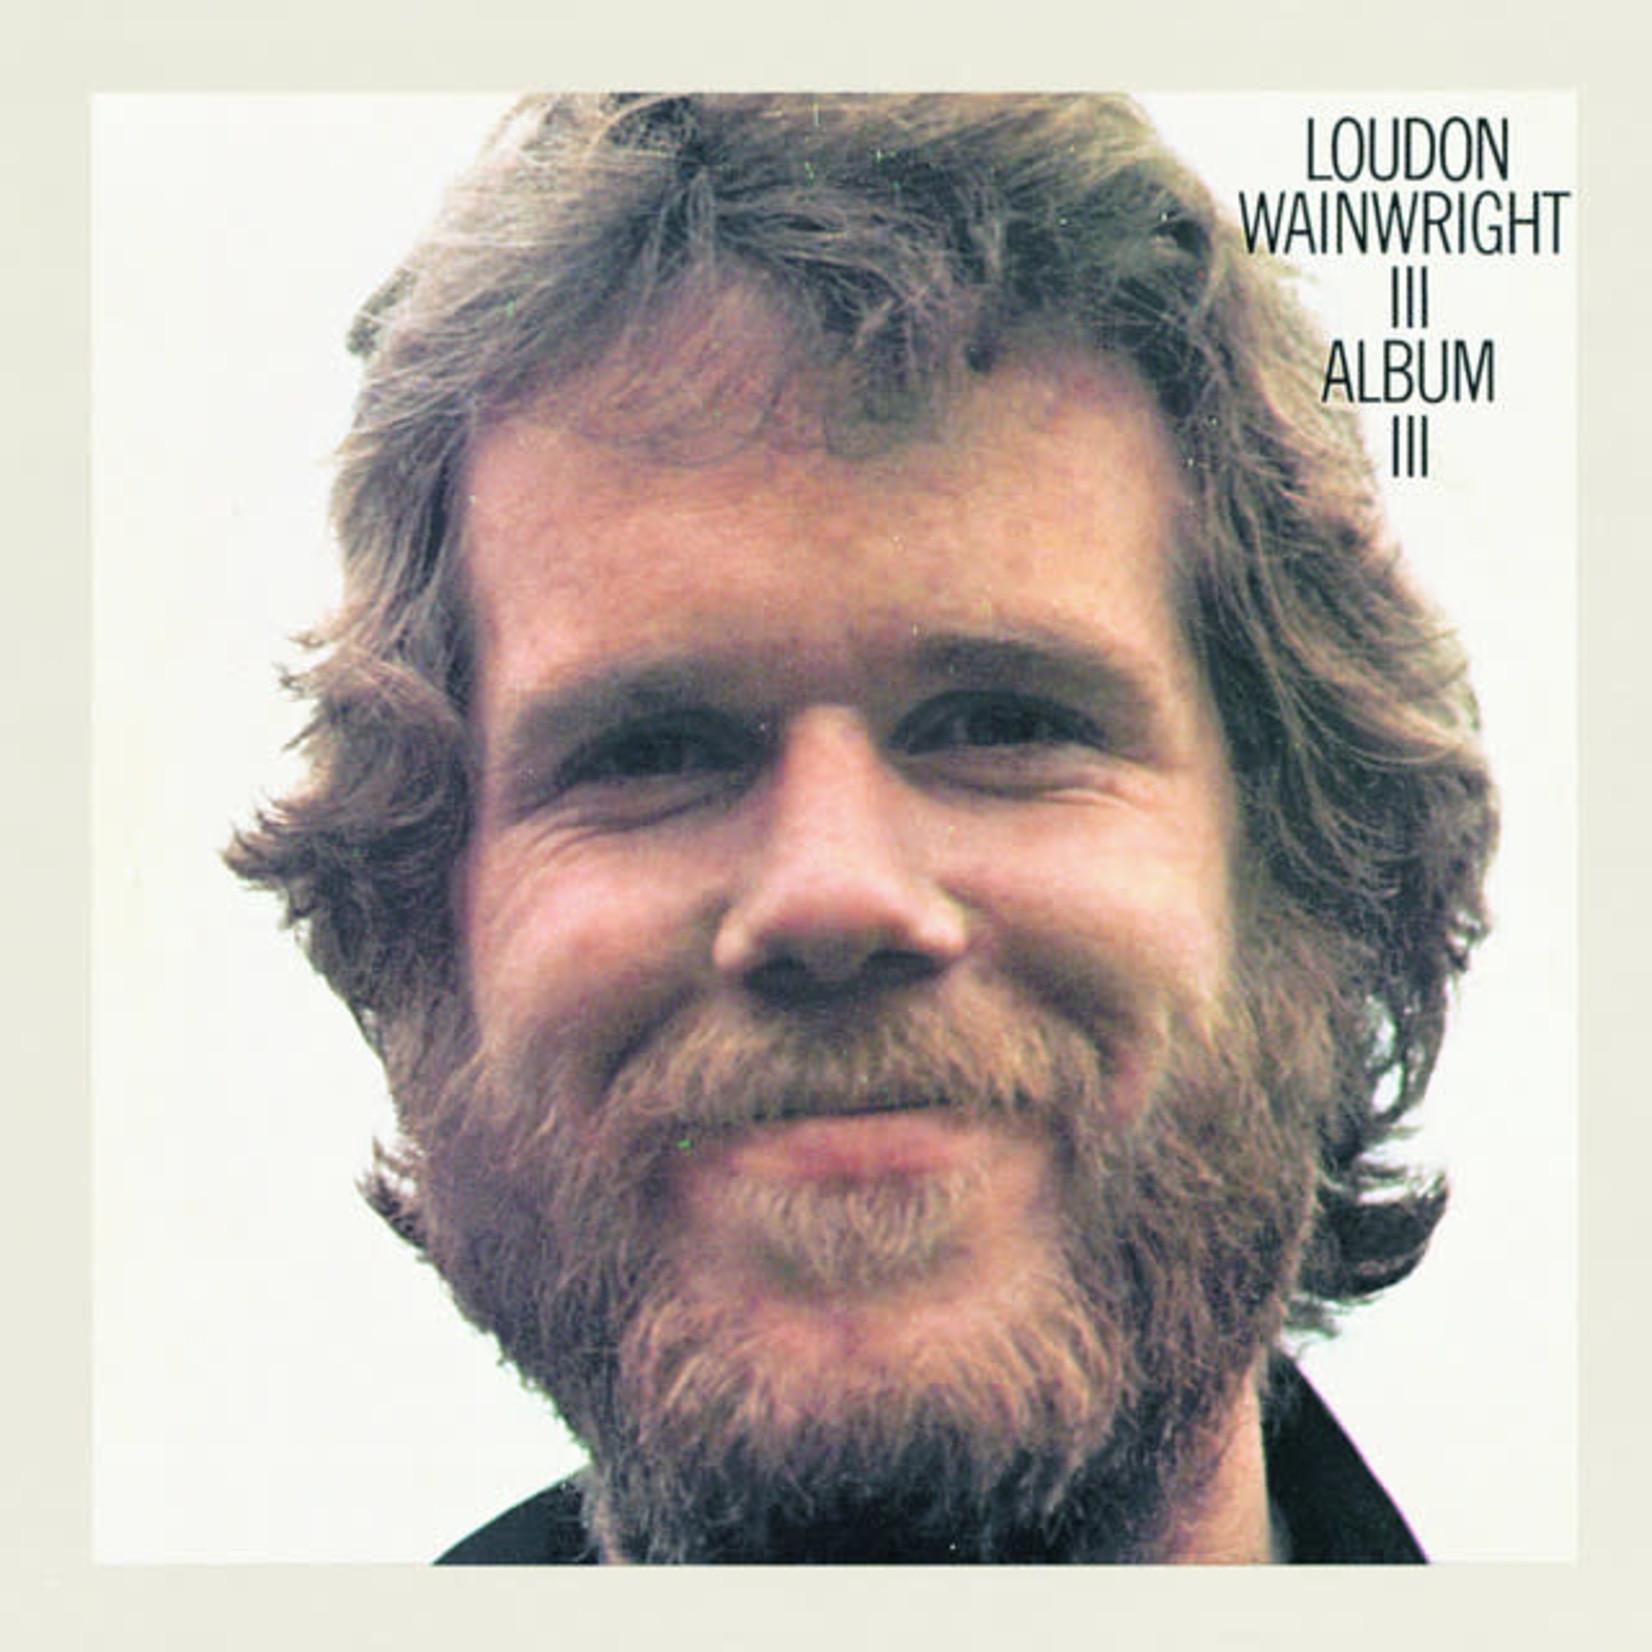 Vinyl Loudon Wainwright - Album III